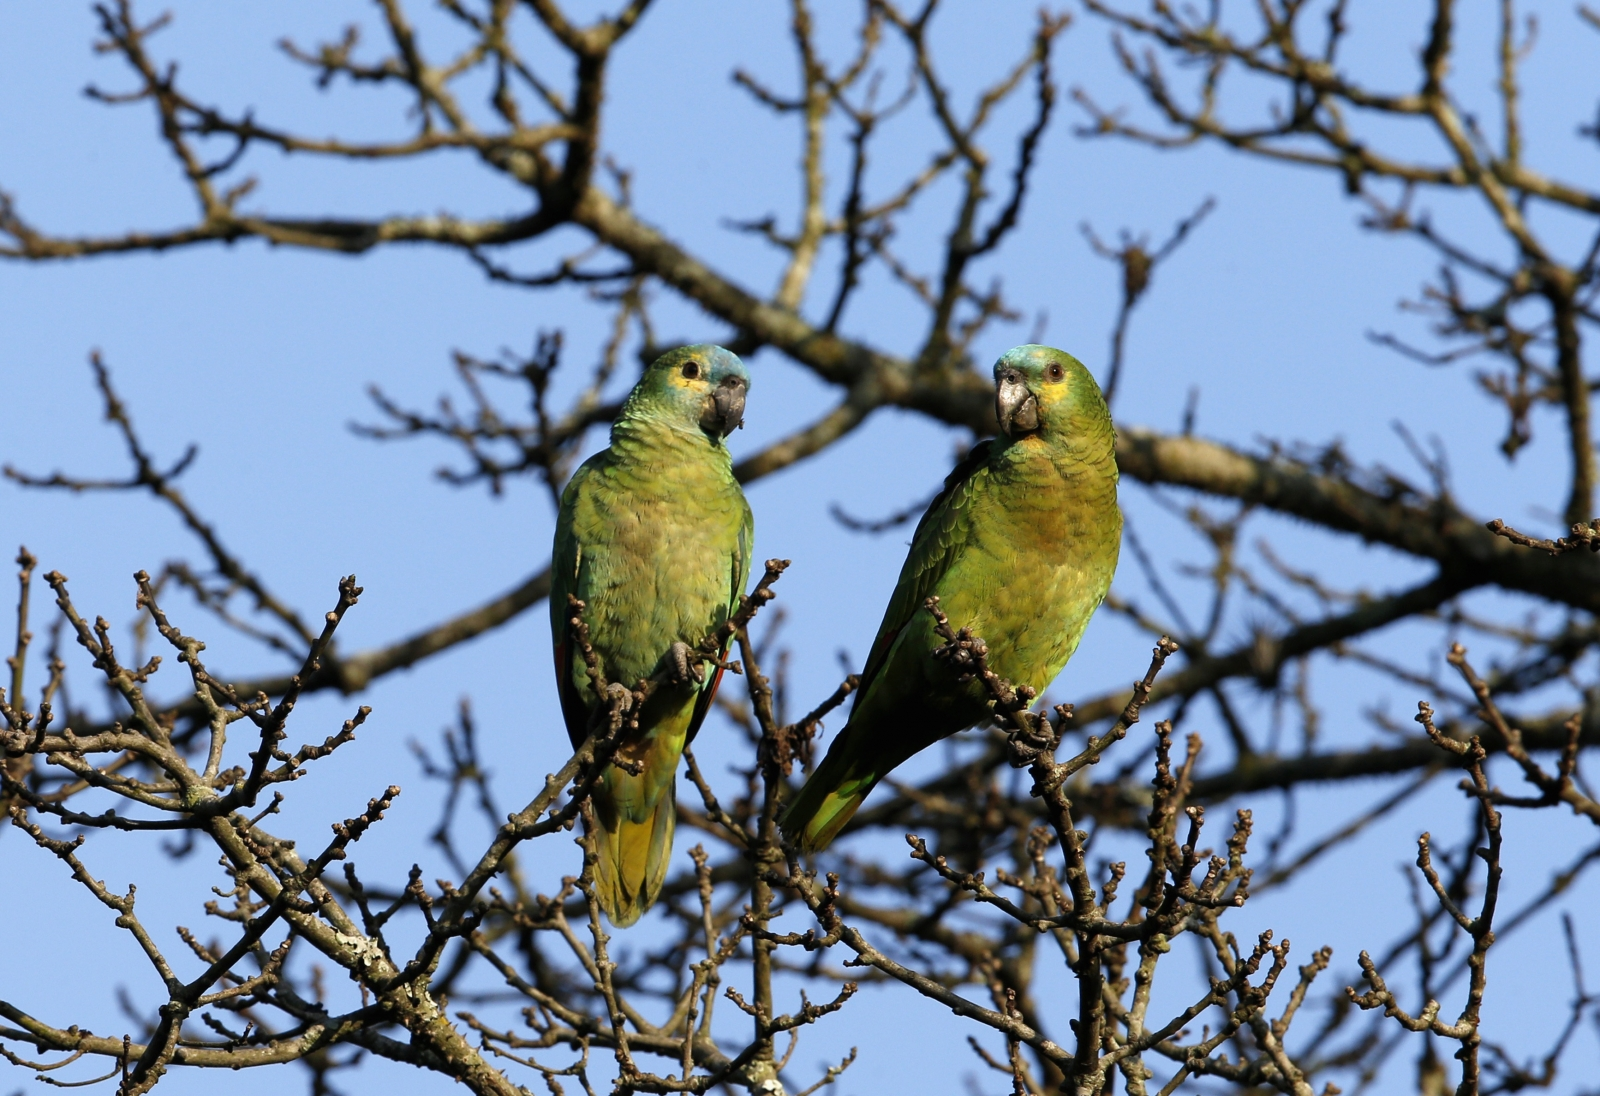 opium addict parrots steals poppy juice